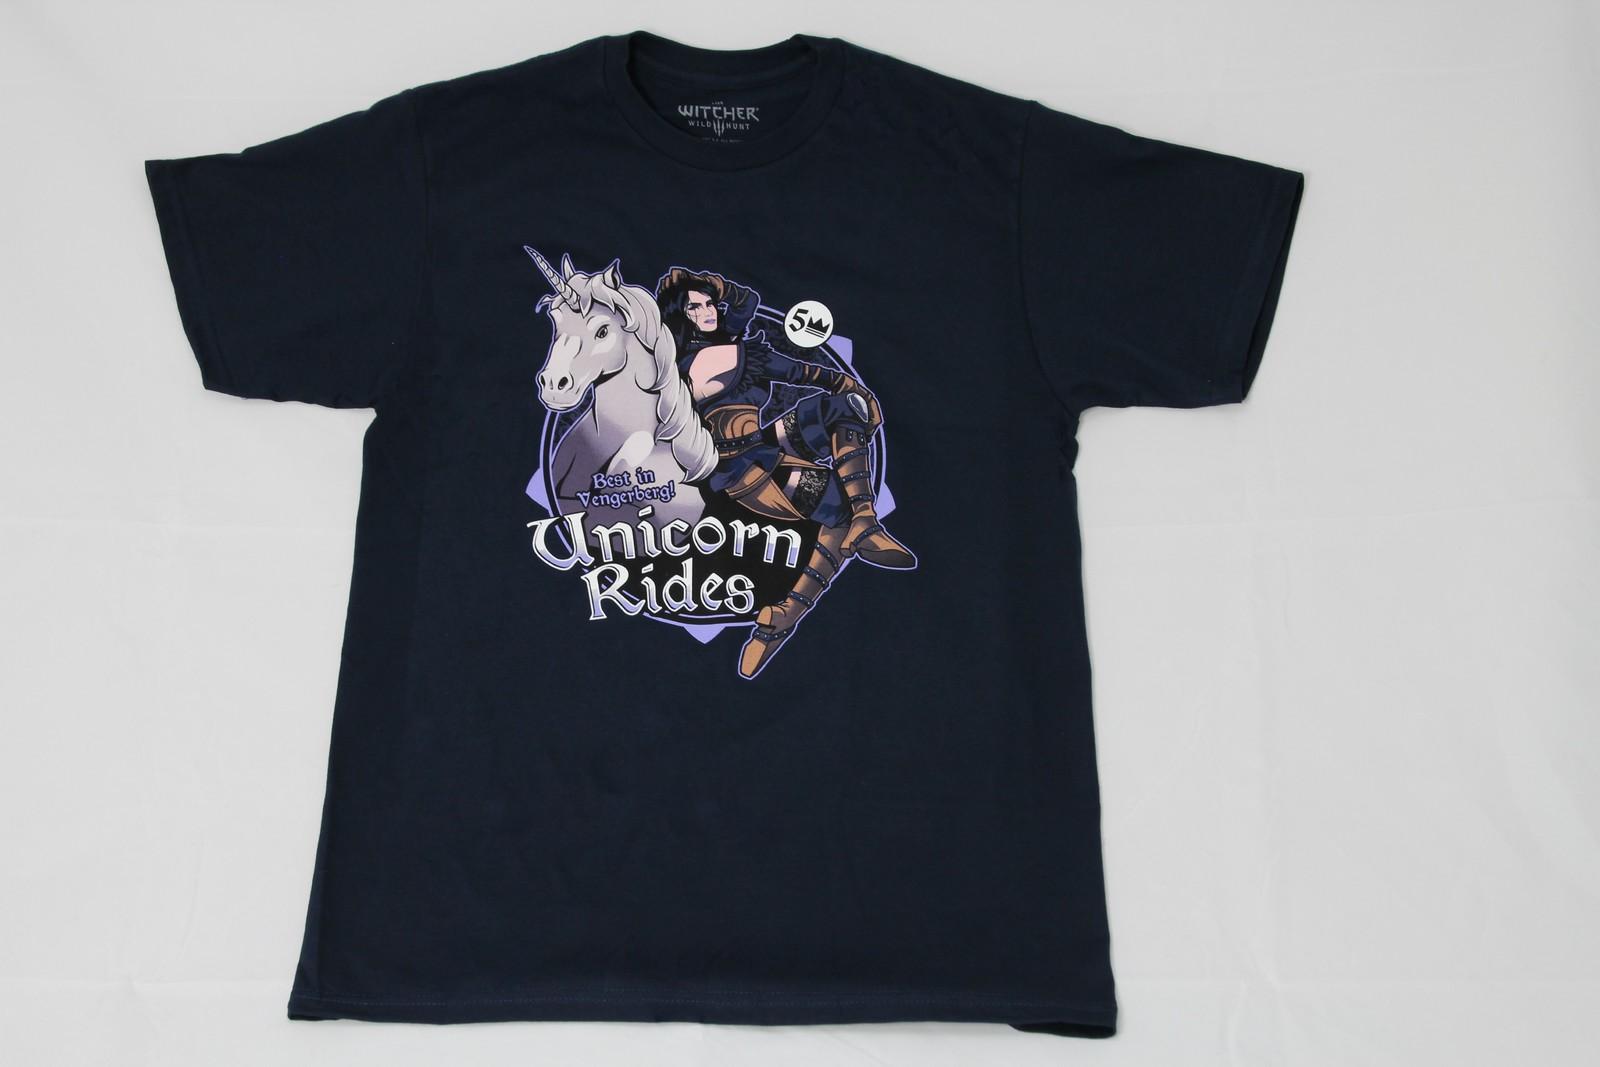 The Witcher 3: Unicorn Riders - Premium T-Shirt (Large) image